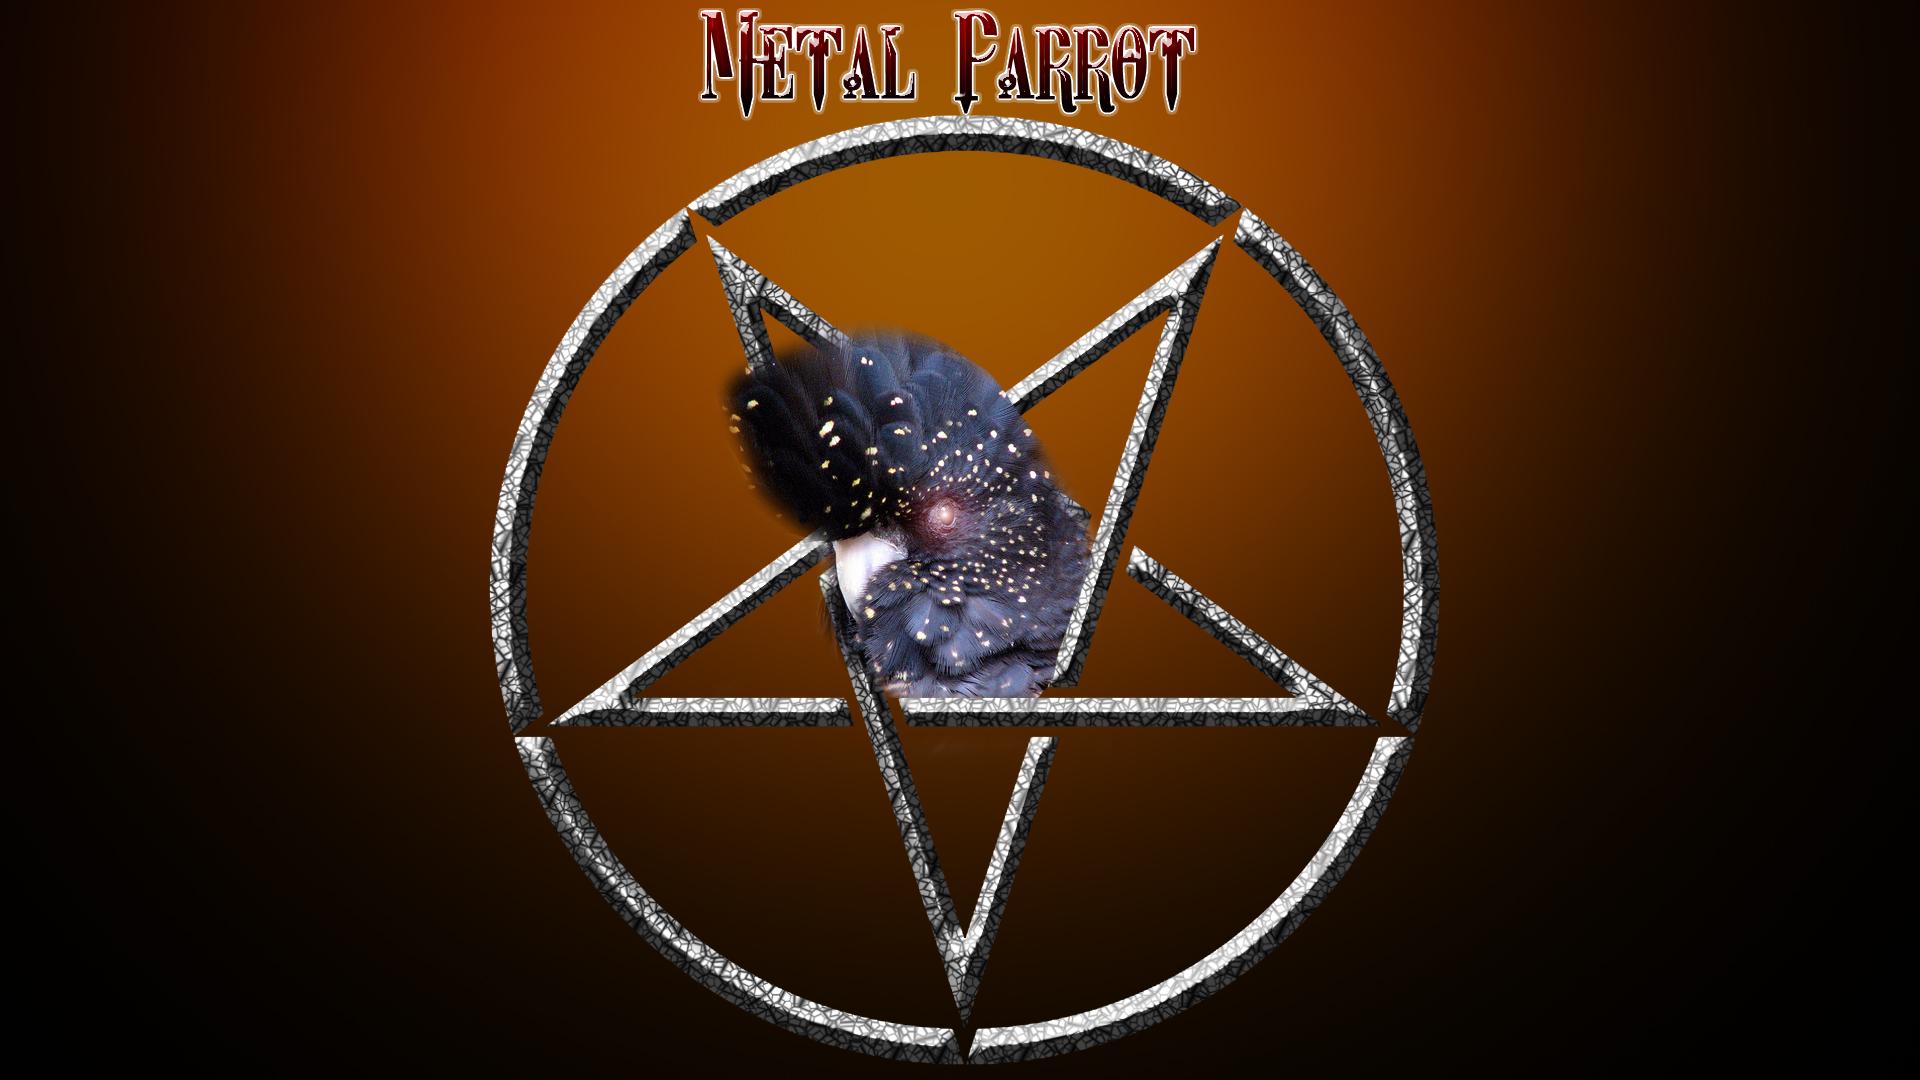 The Metal Parrot Orange!